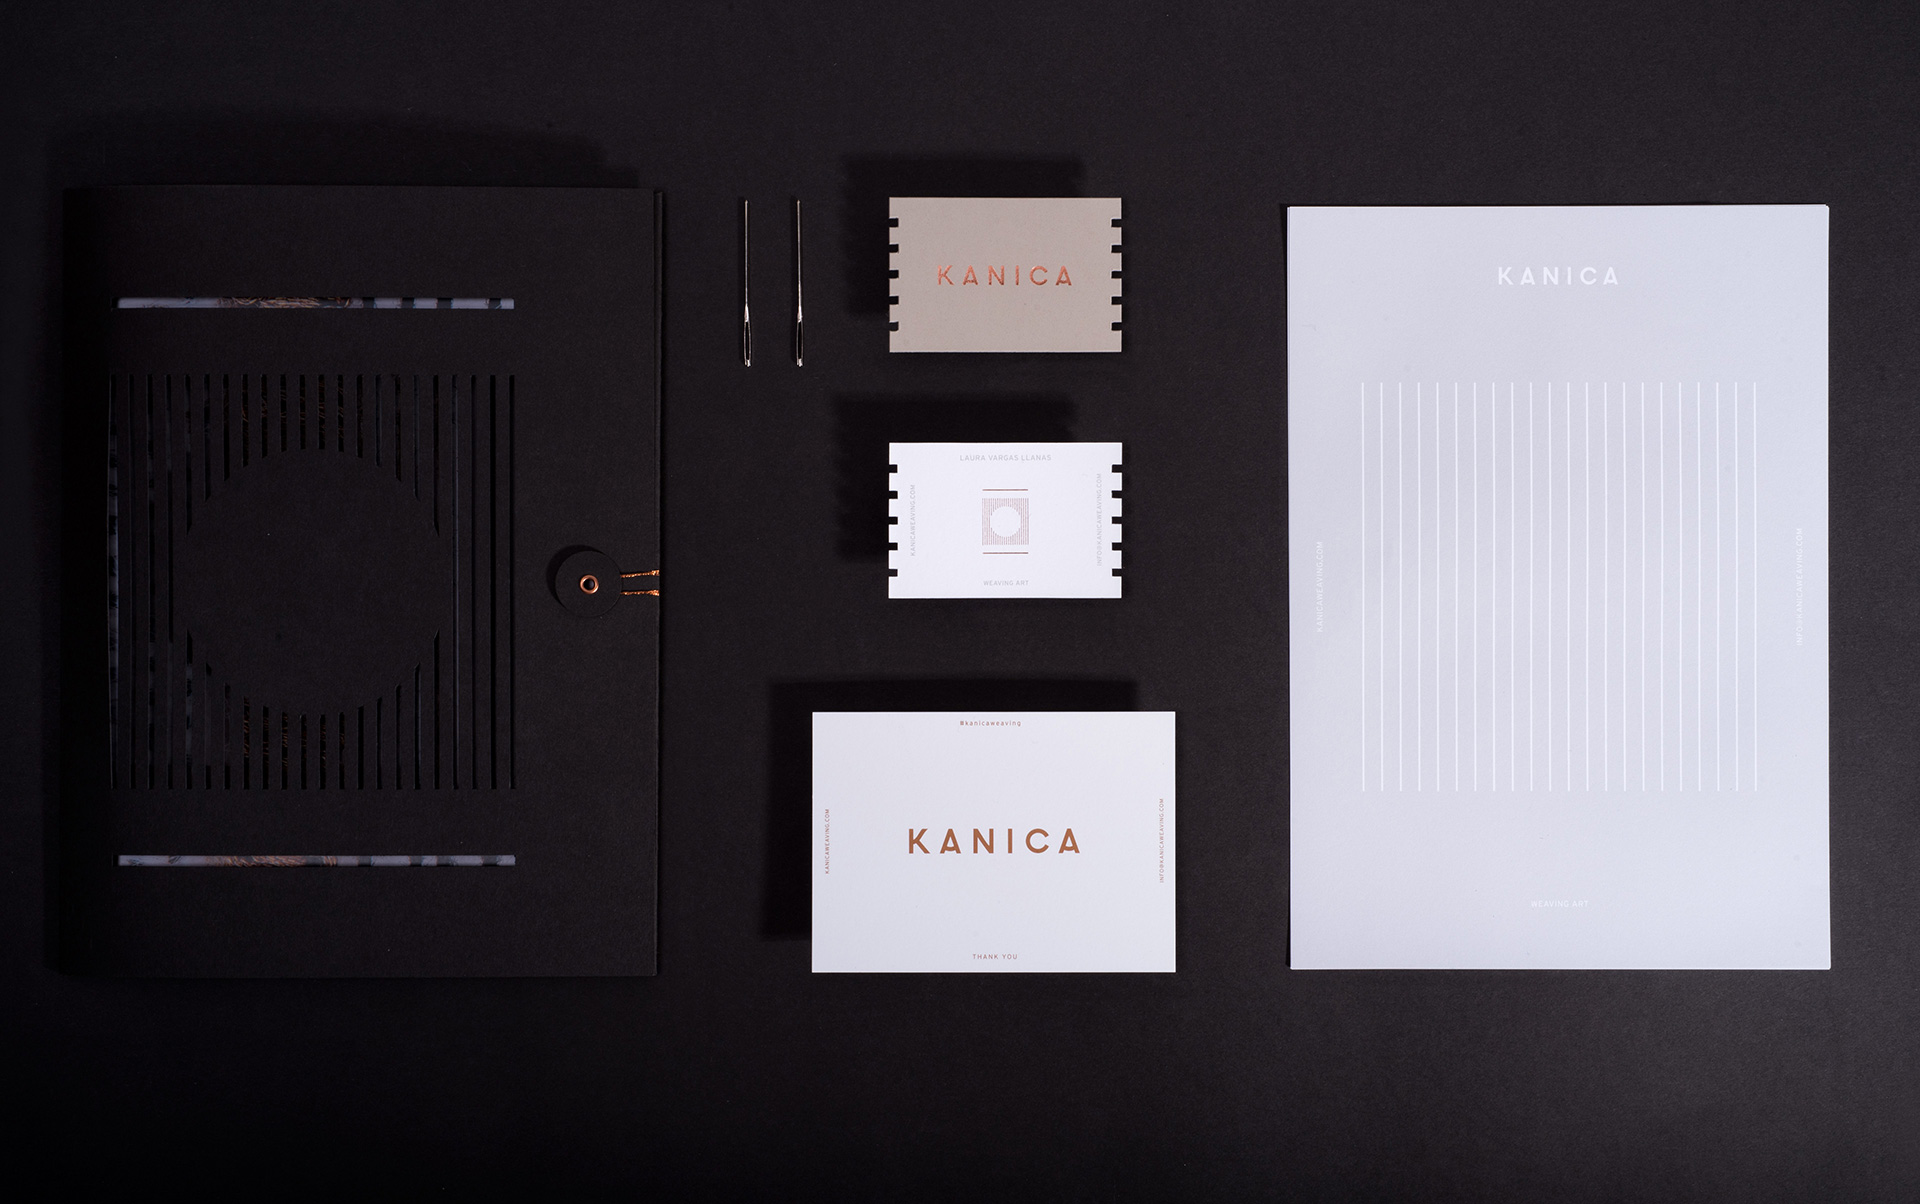 kanica_8